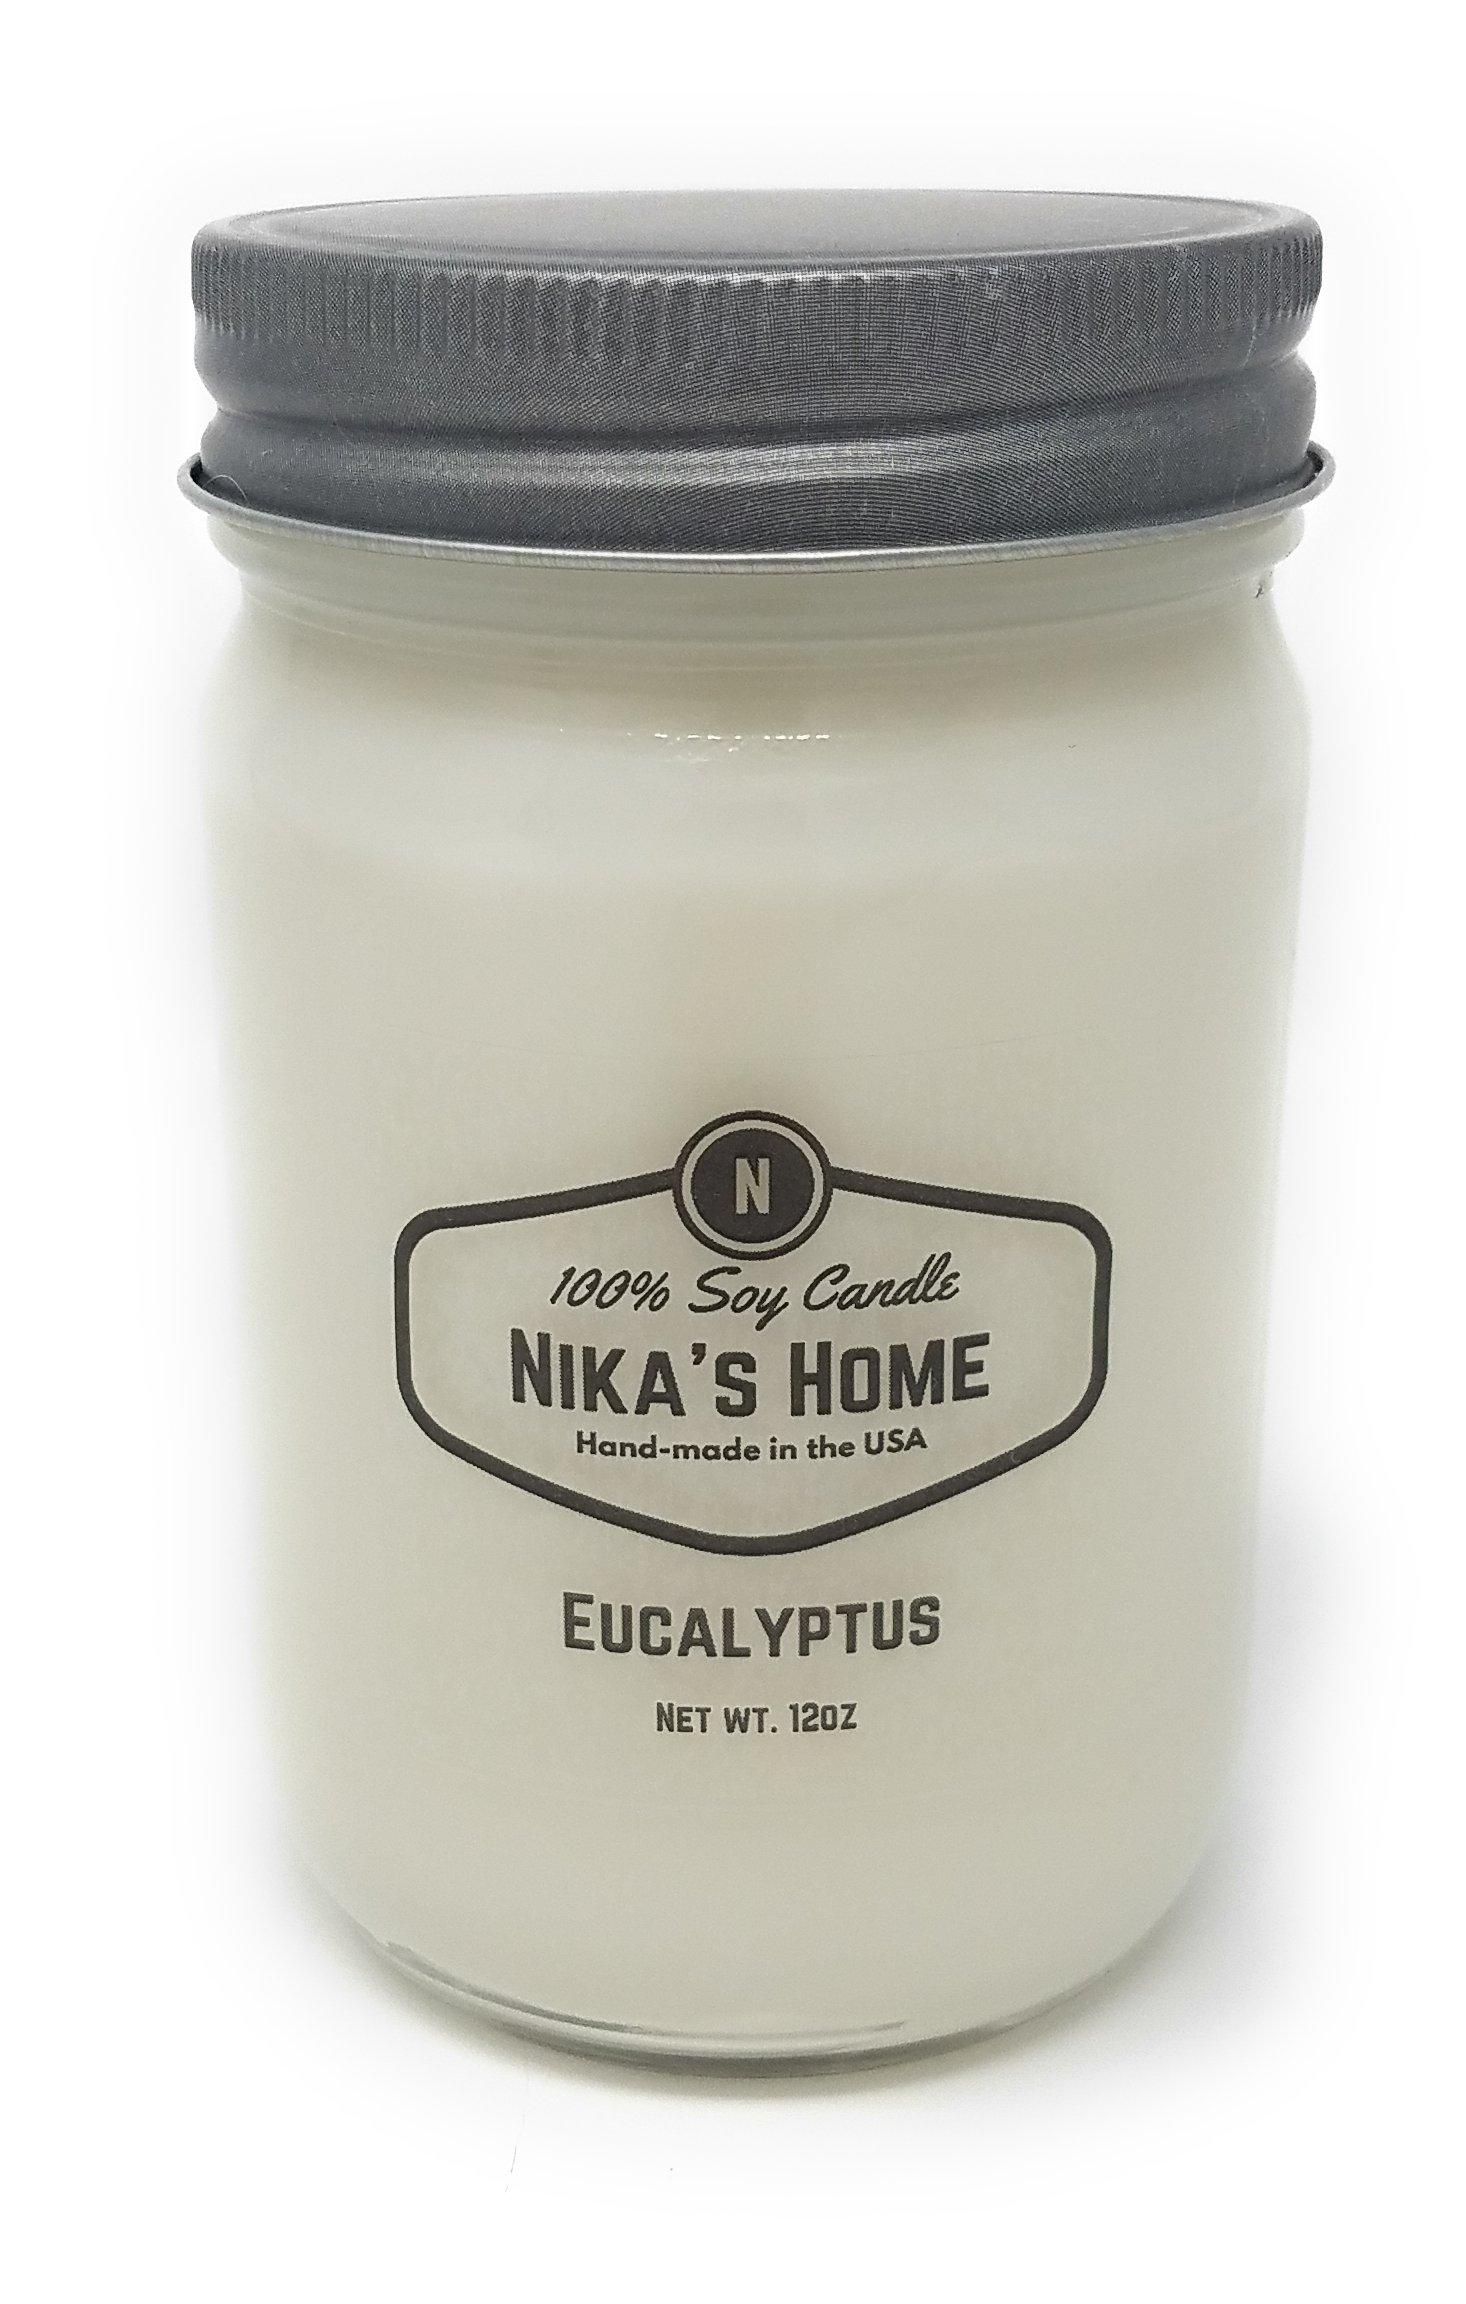 Nika's Home Eucalyptus 12oz Mason Soy Candle